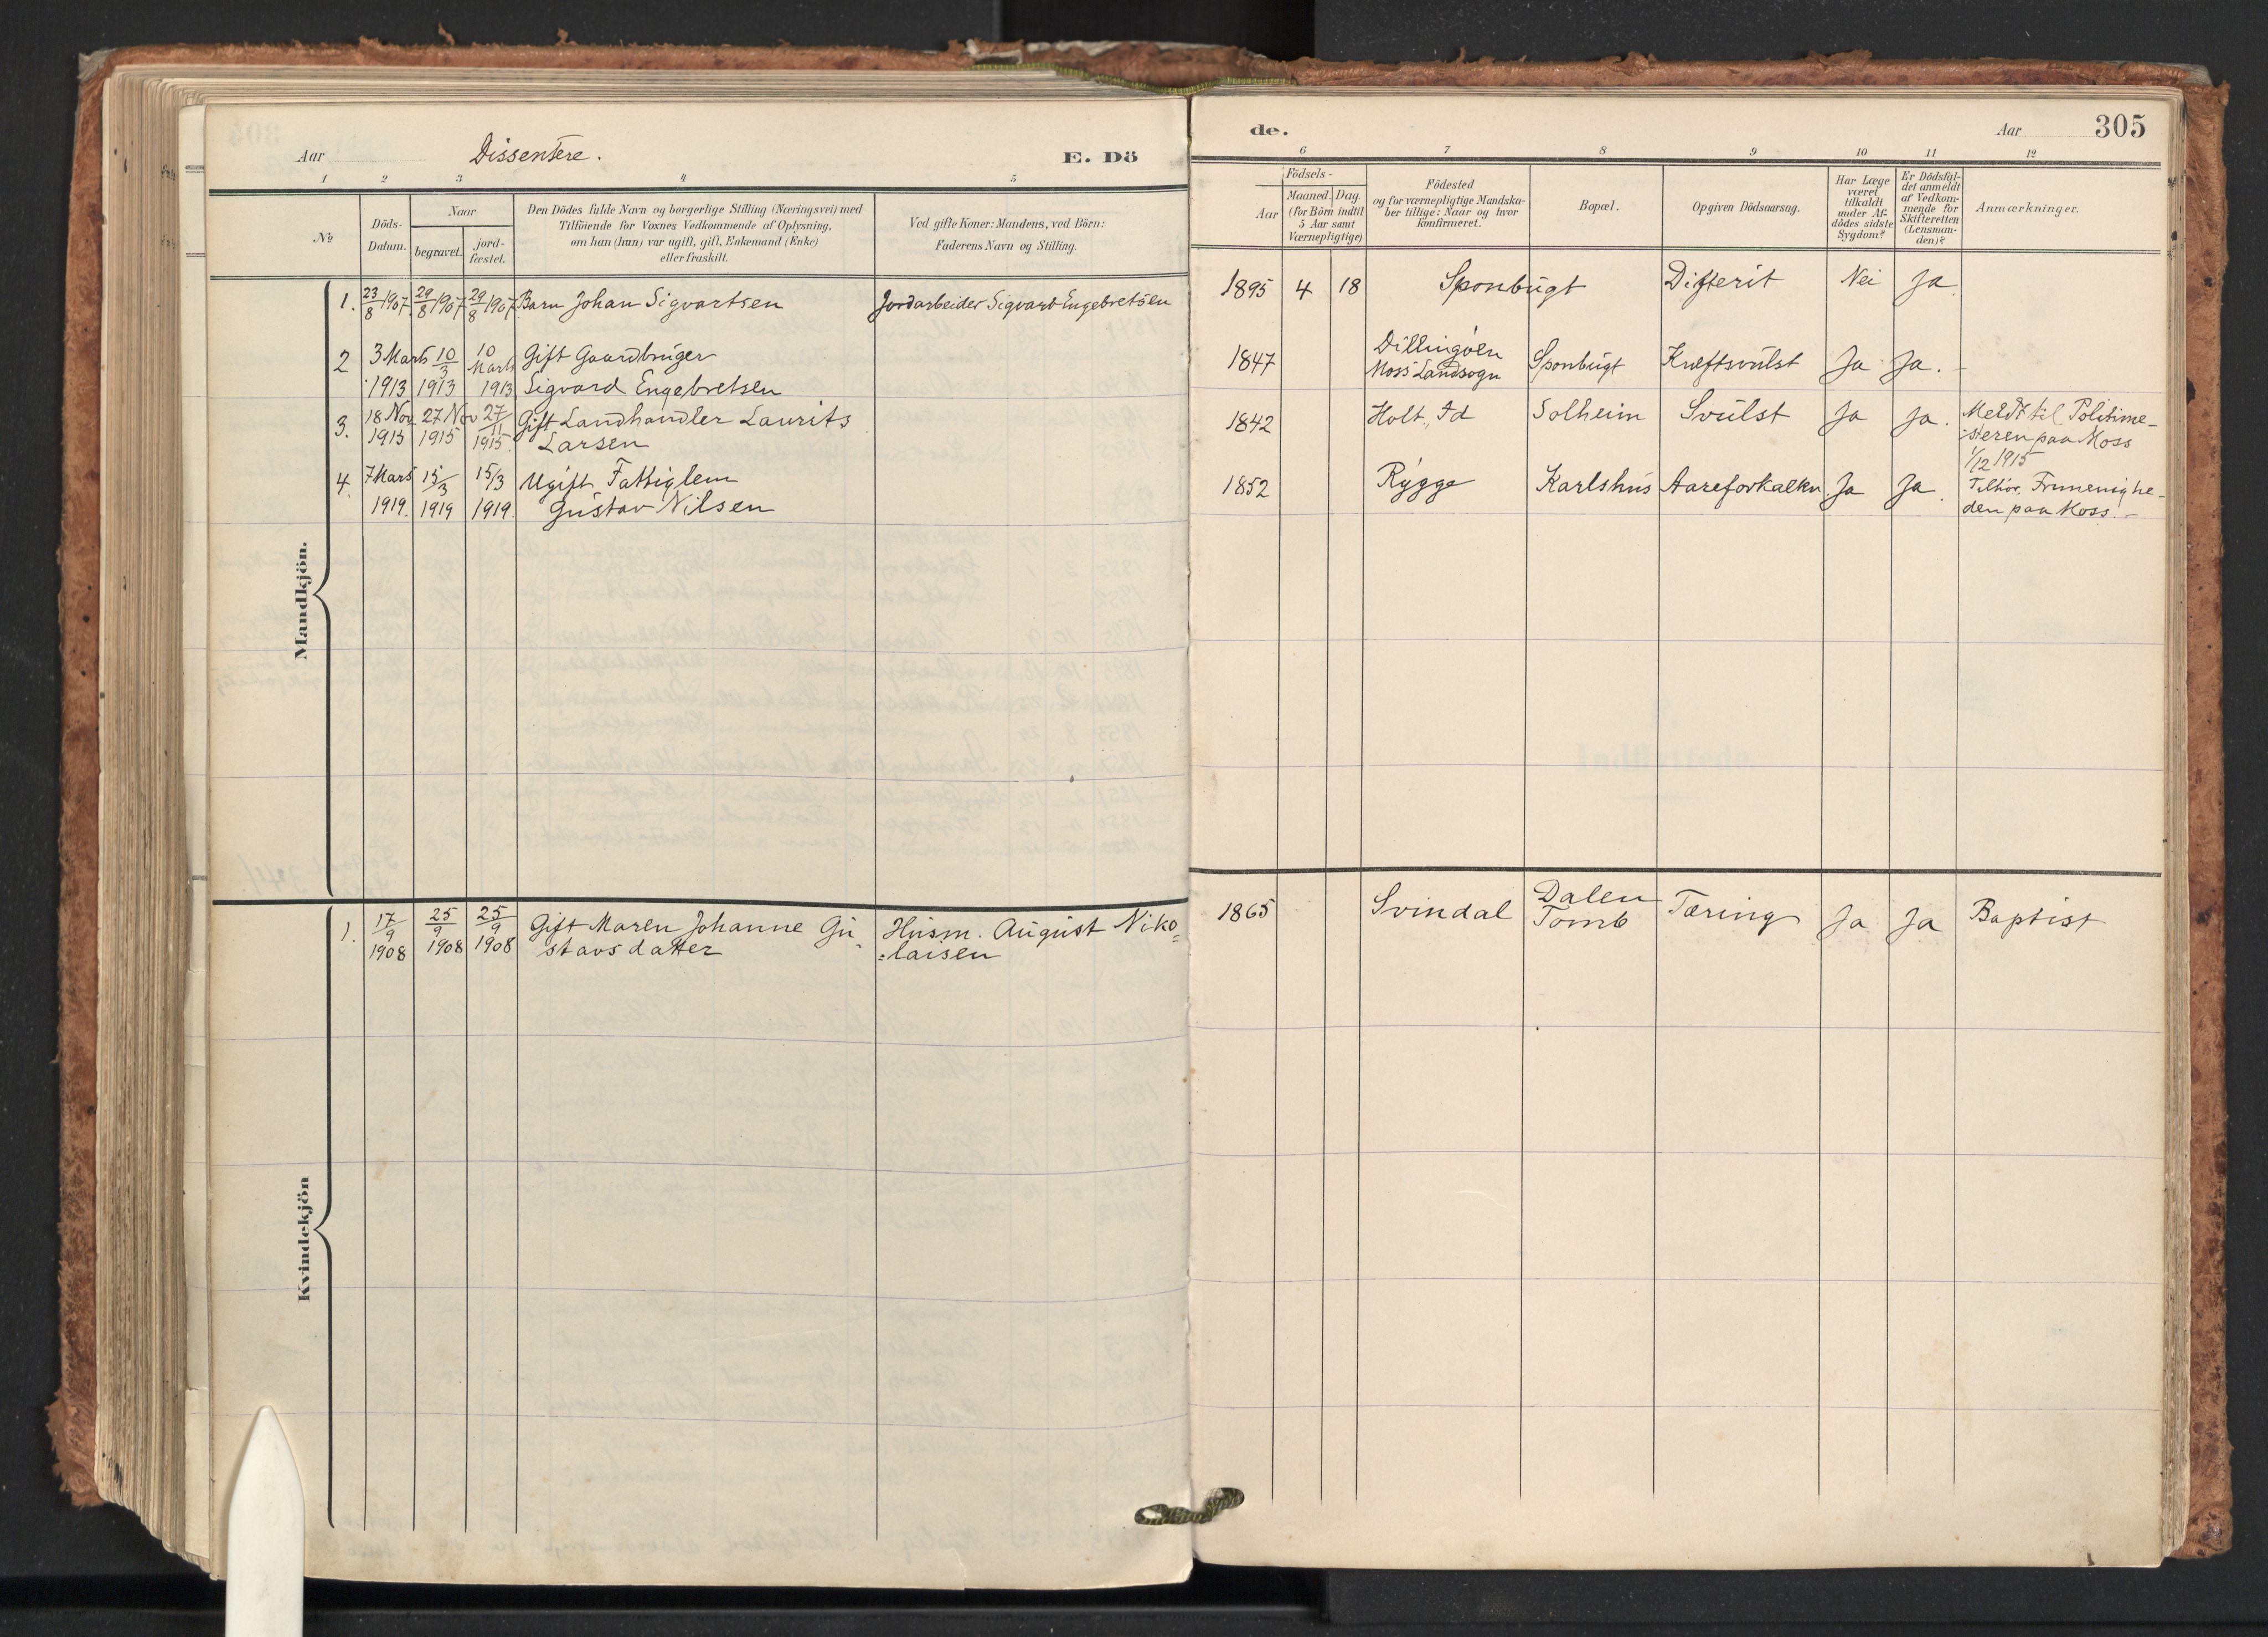 SAO, Råde prestekontor kirkebøker, F/Fa/L0008: Ministerialbok nr. 8, 1903-1924, s. 305